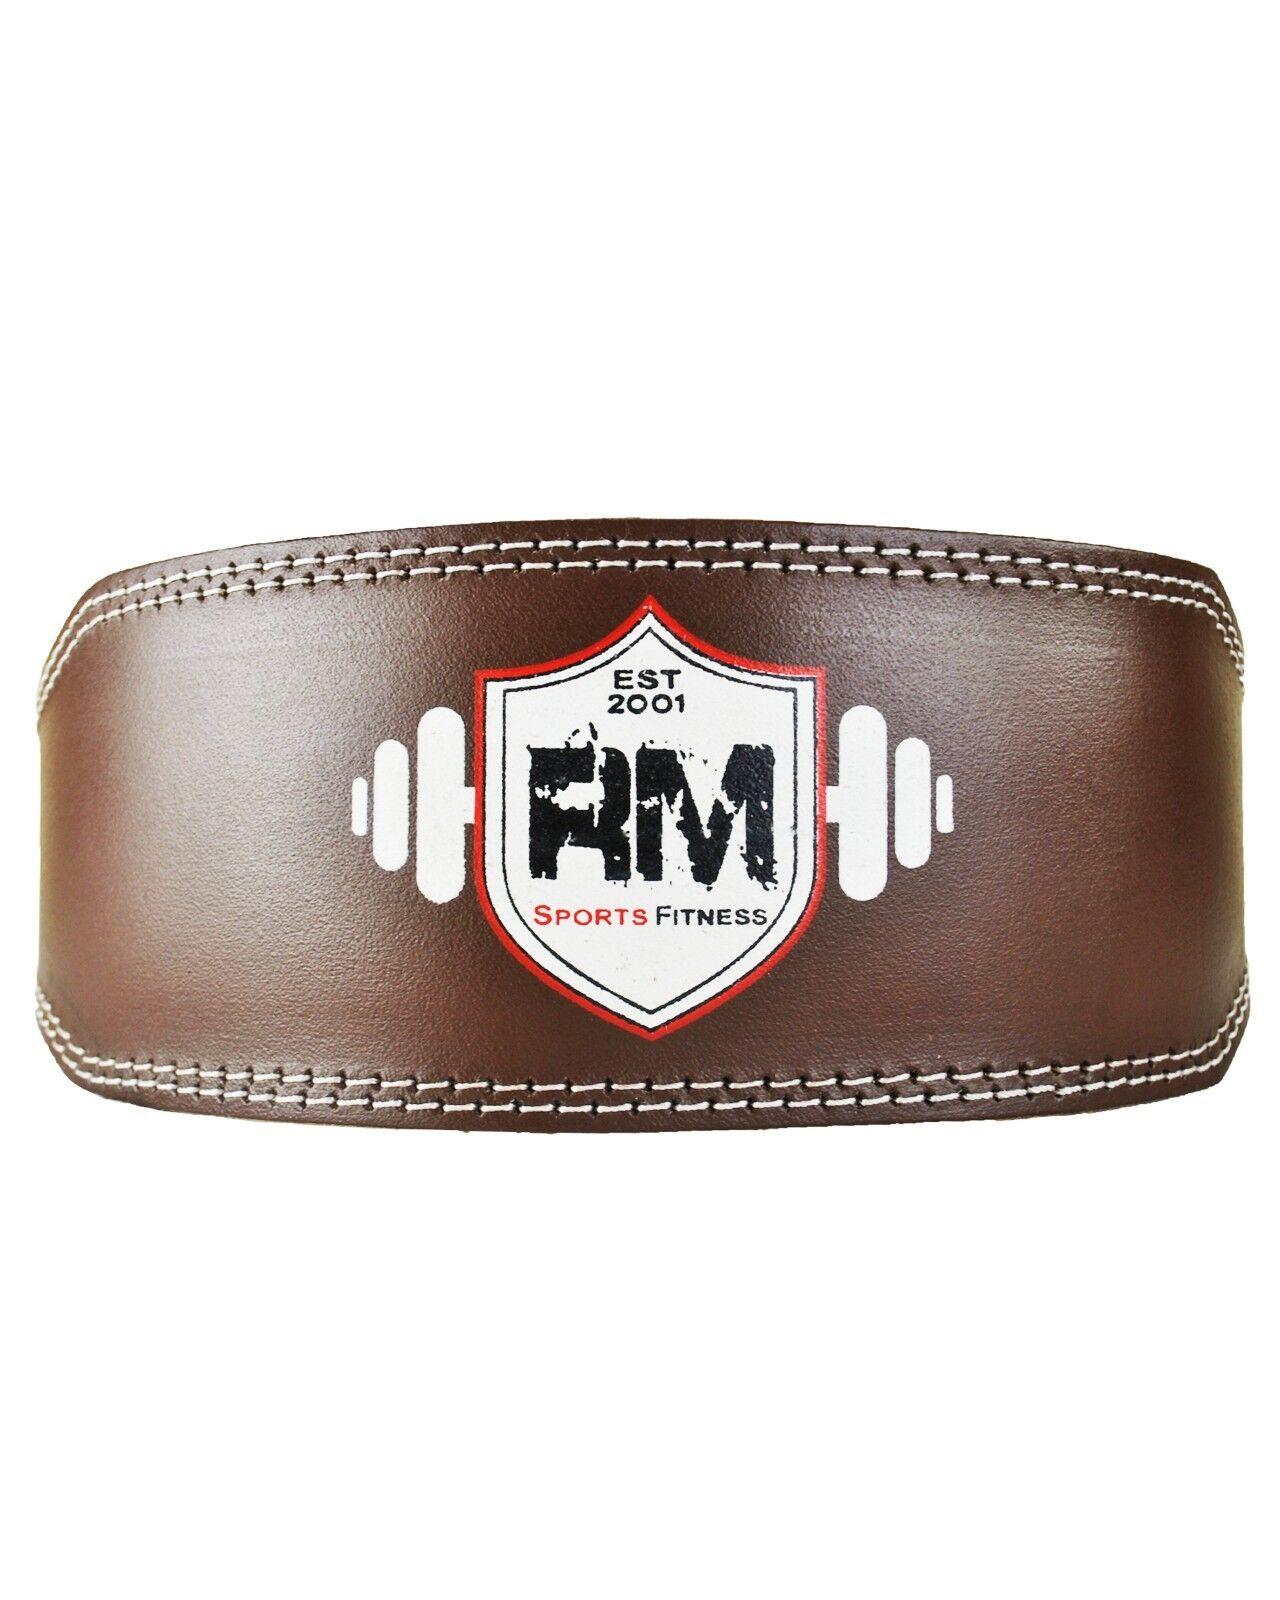 Ringmasteruk cuir véritable Lifting Puissance Poids Lifting véritable Ceinture Gym Entraînement Fitness 60c701